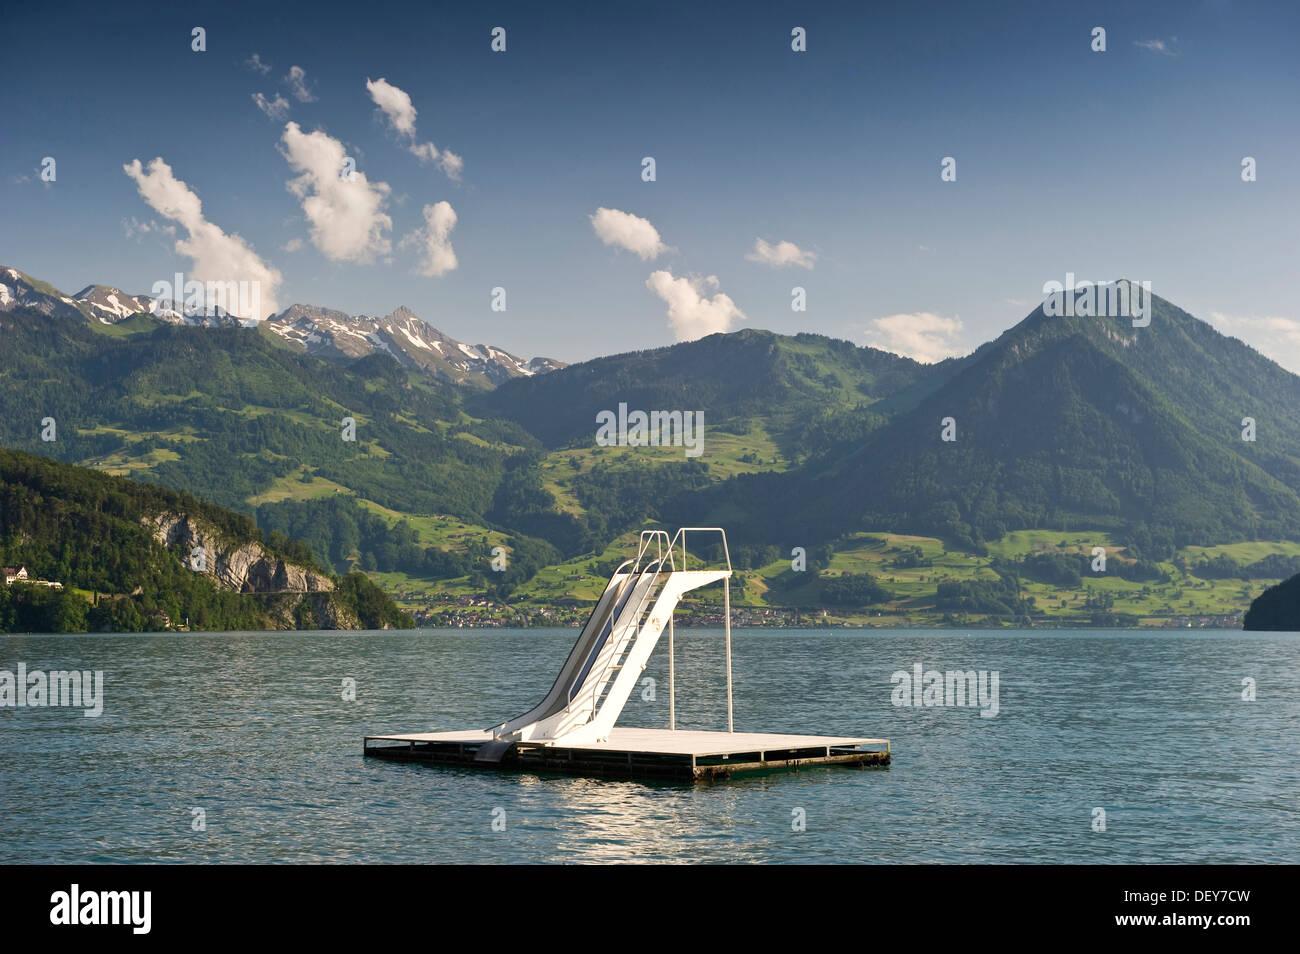 Vitznau, tobogán de agua, el lago de Lucerna, el cantón de Lucerna, Suiza, Europa Imagen De Stock